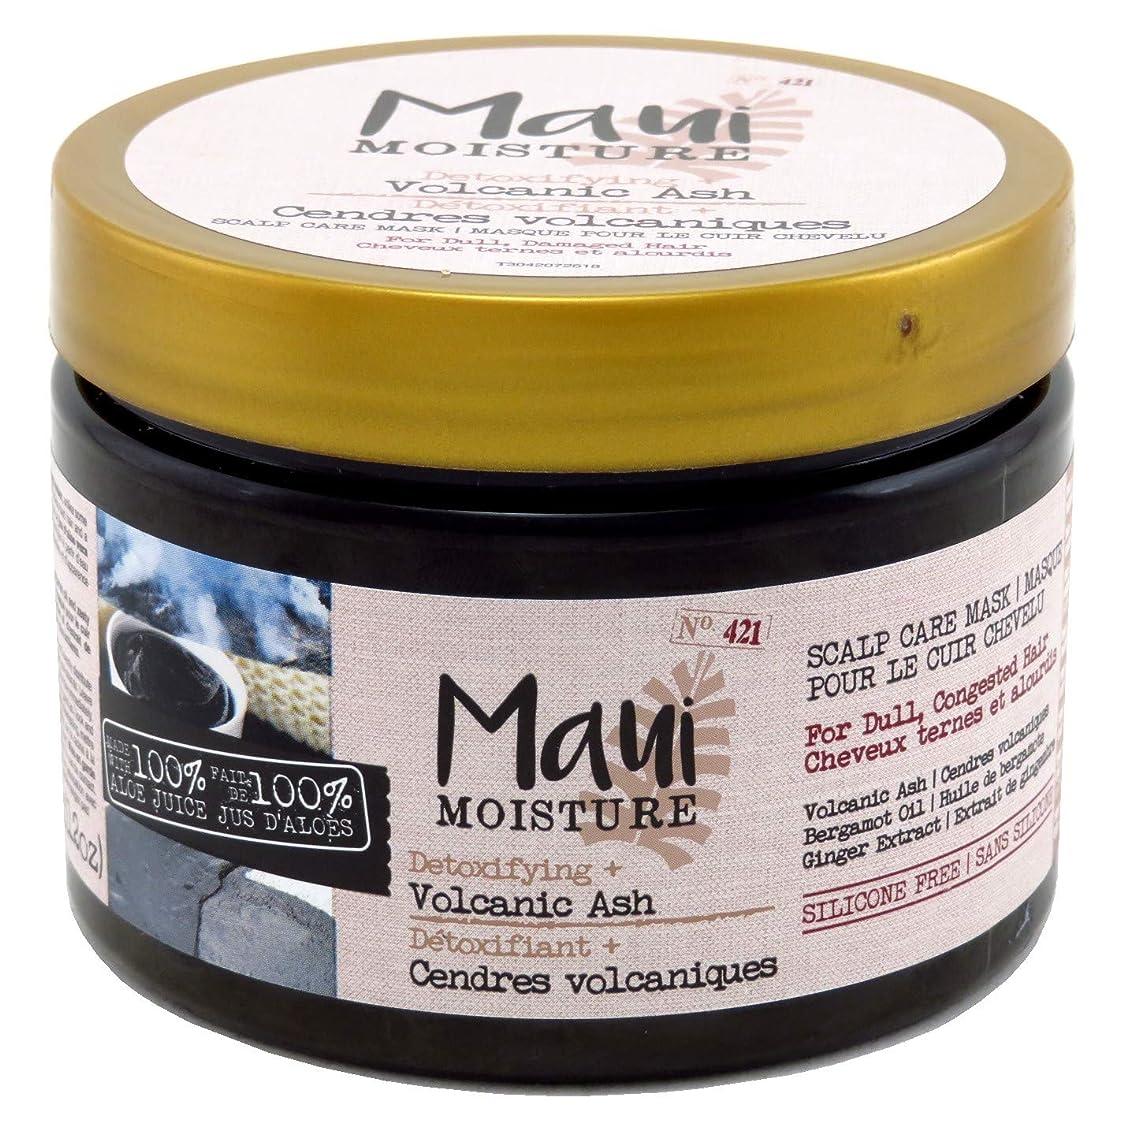 Maui Moisture Scalp Care Mask Volcanic Ash 12 Ounce Jar (3 Pack)